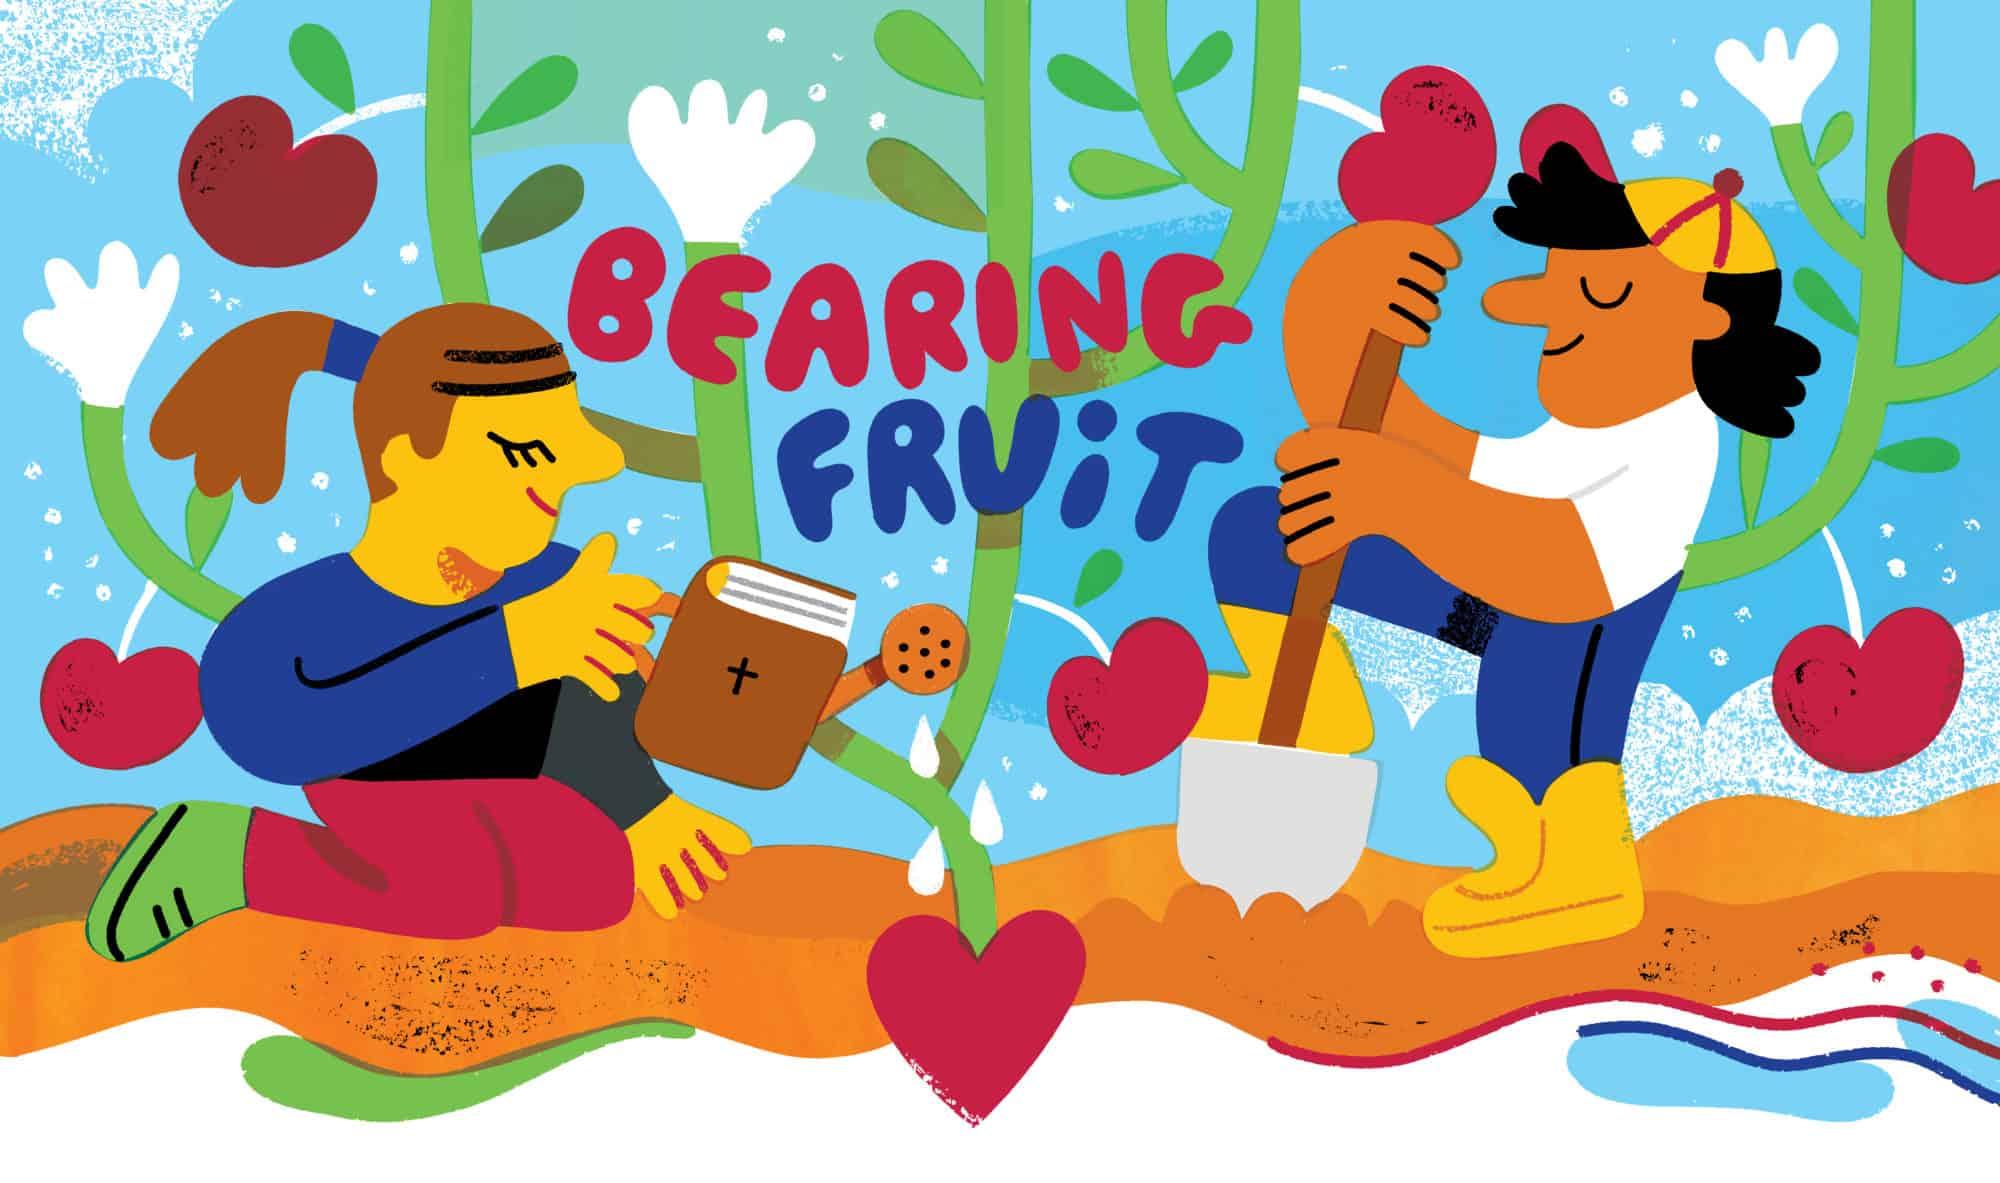 COMPASSION_bearingfruit